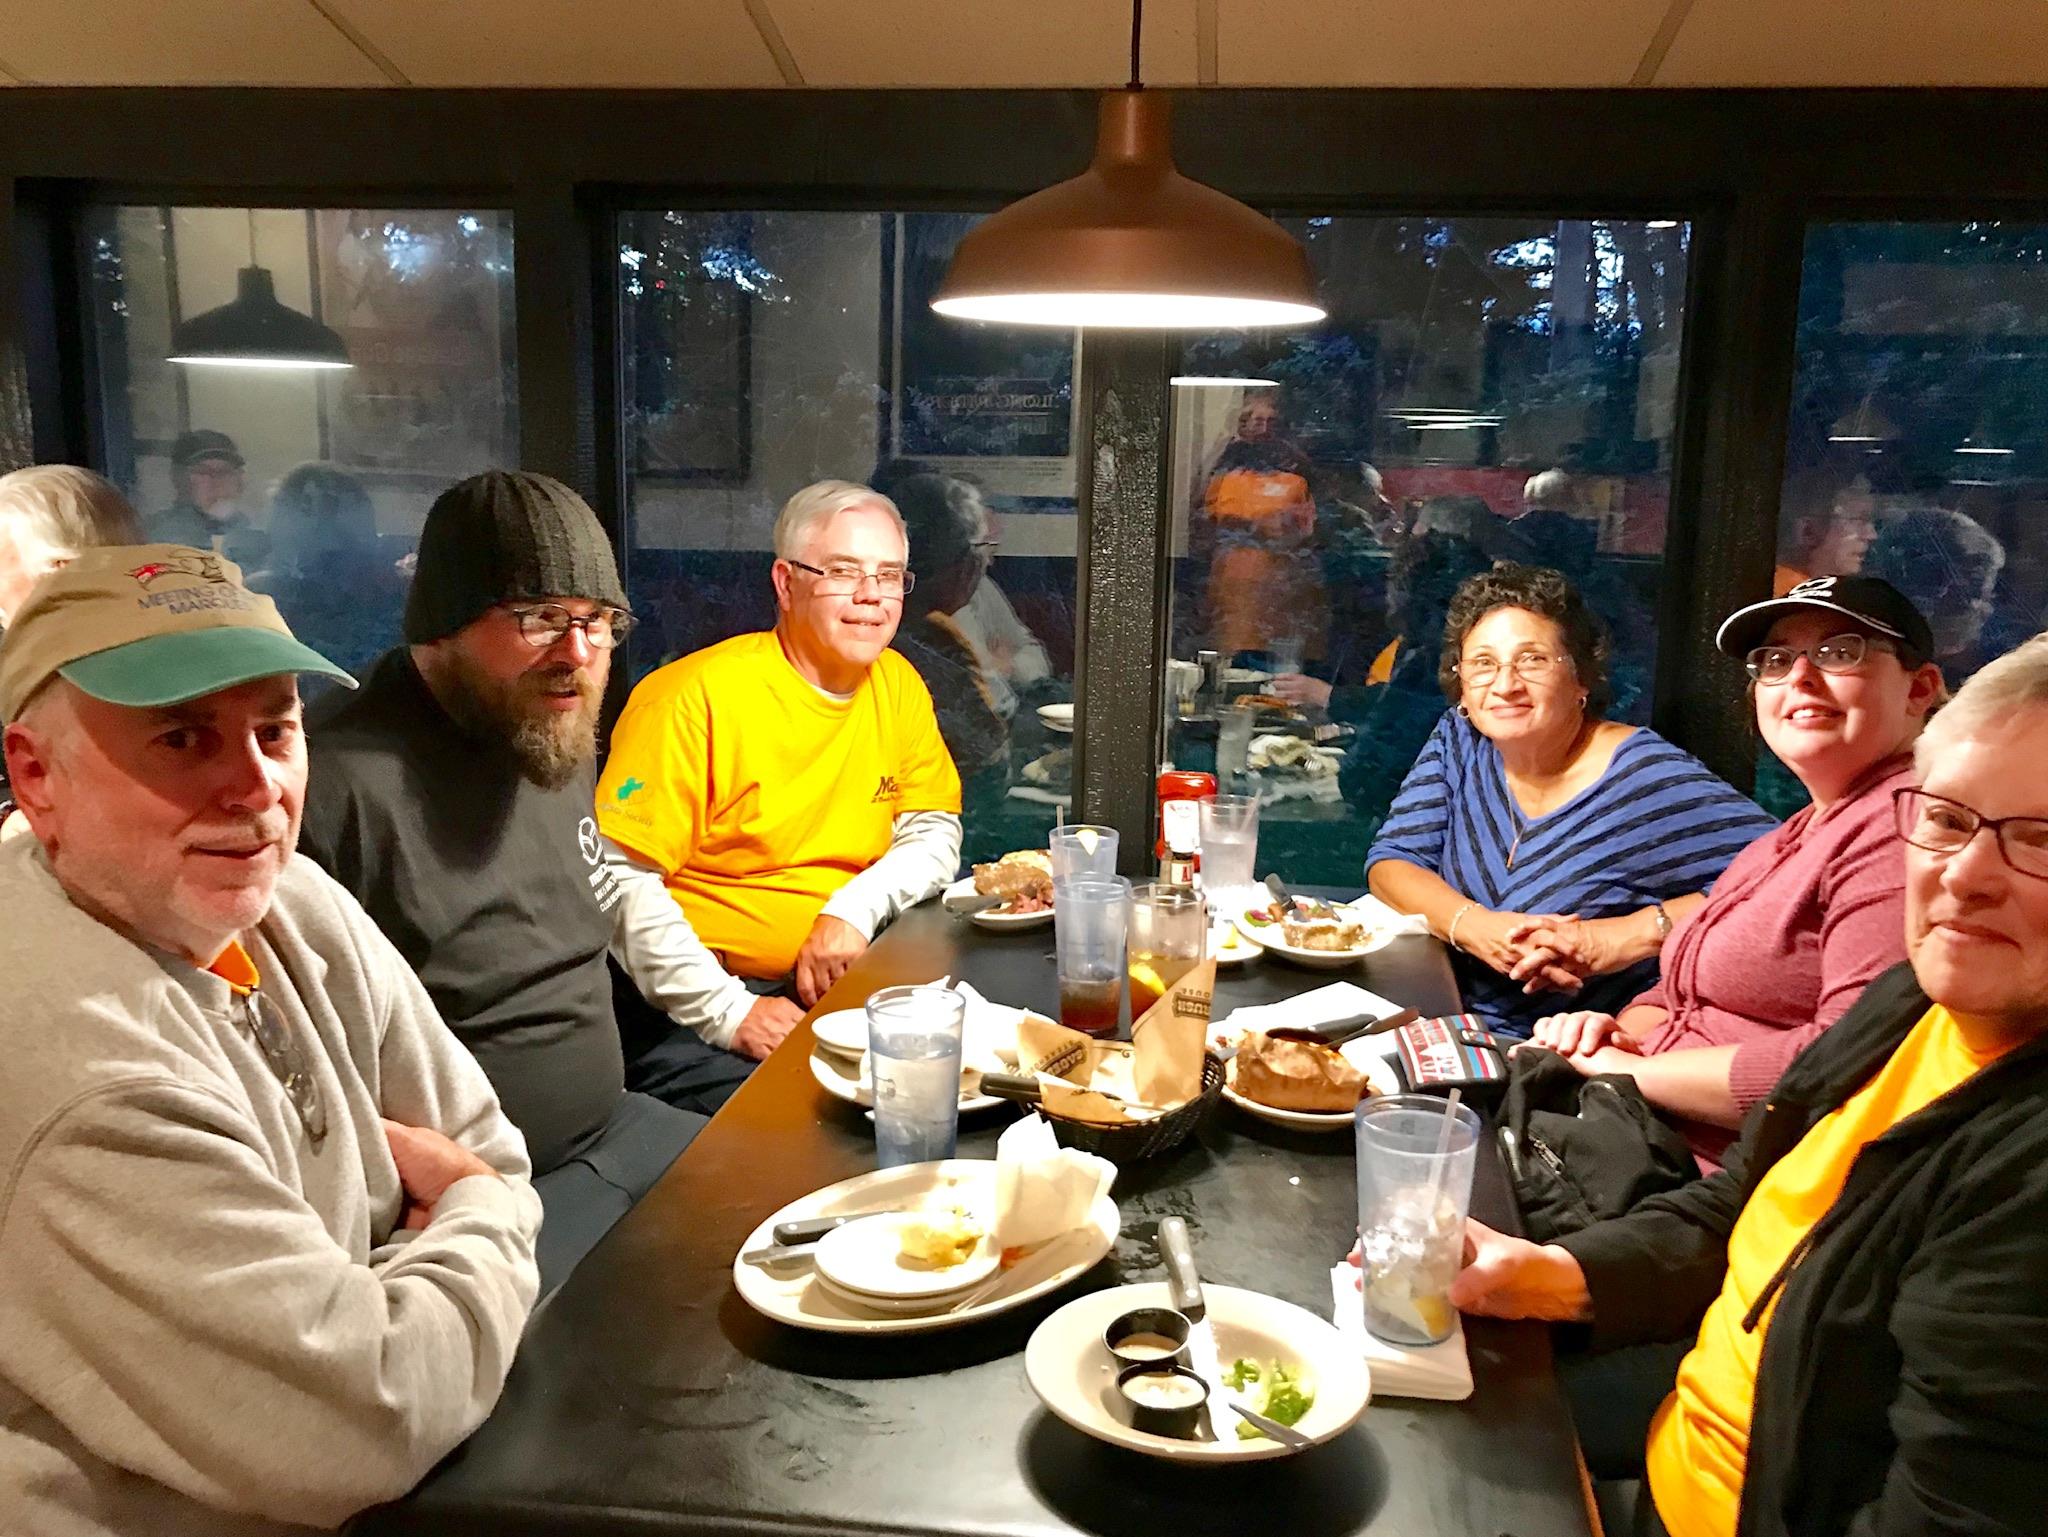 Saturday dinner at Sagebrush. Clockwise from left: Joe Neely, Josh Williams, Curt Springstead, Anne Springstead, Krystal Williams, Donna Neely.